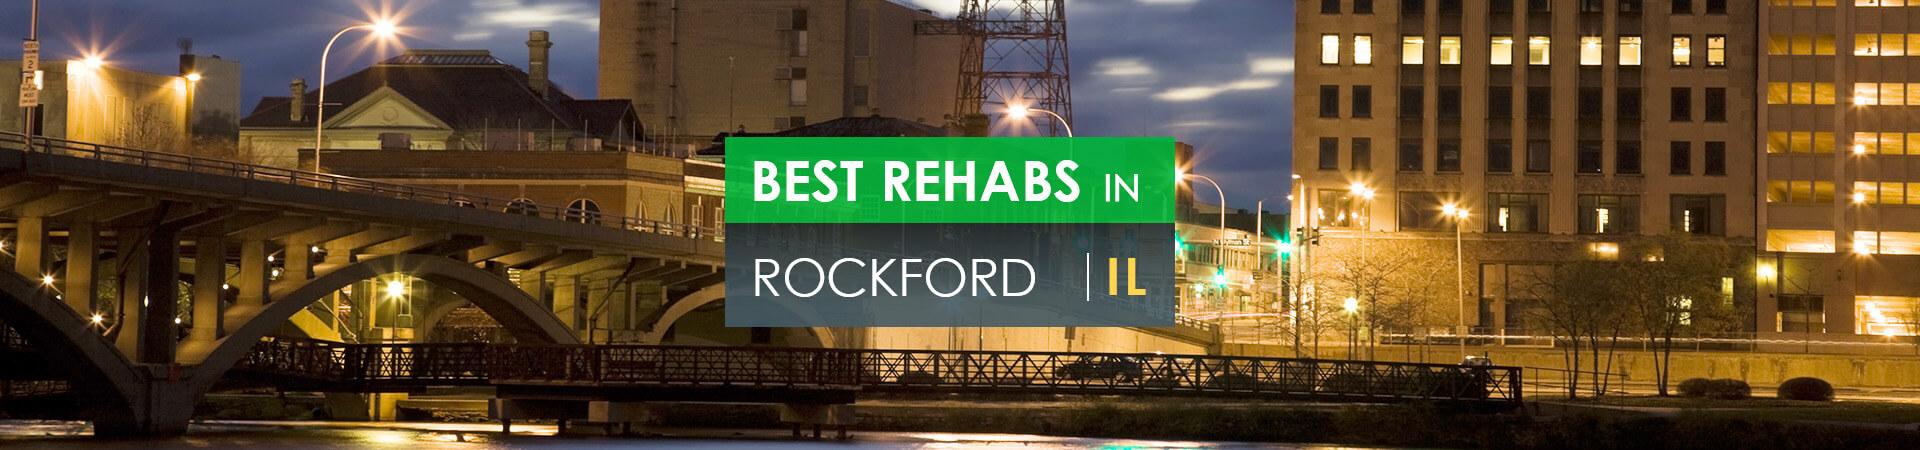 Best rehabs in Rockford, IL